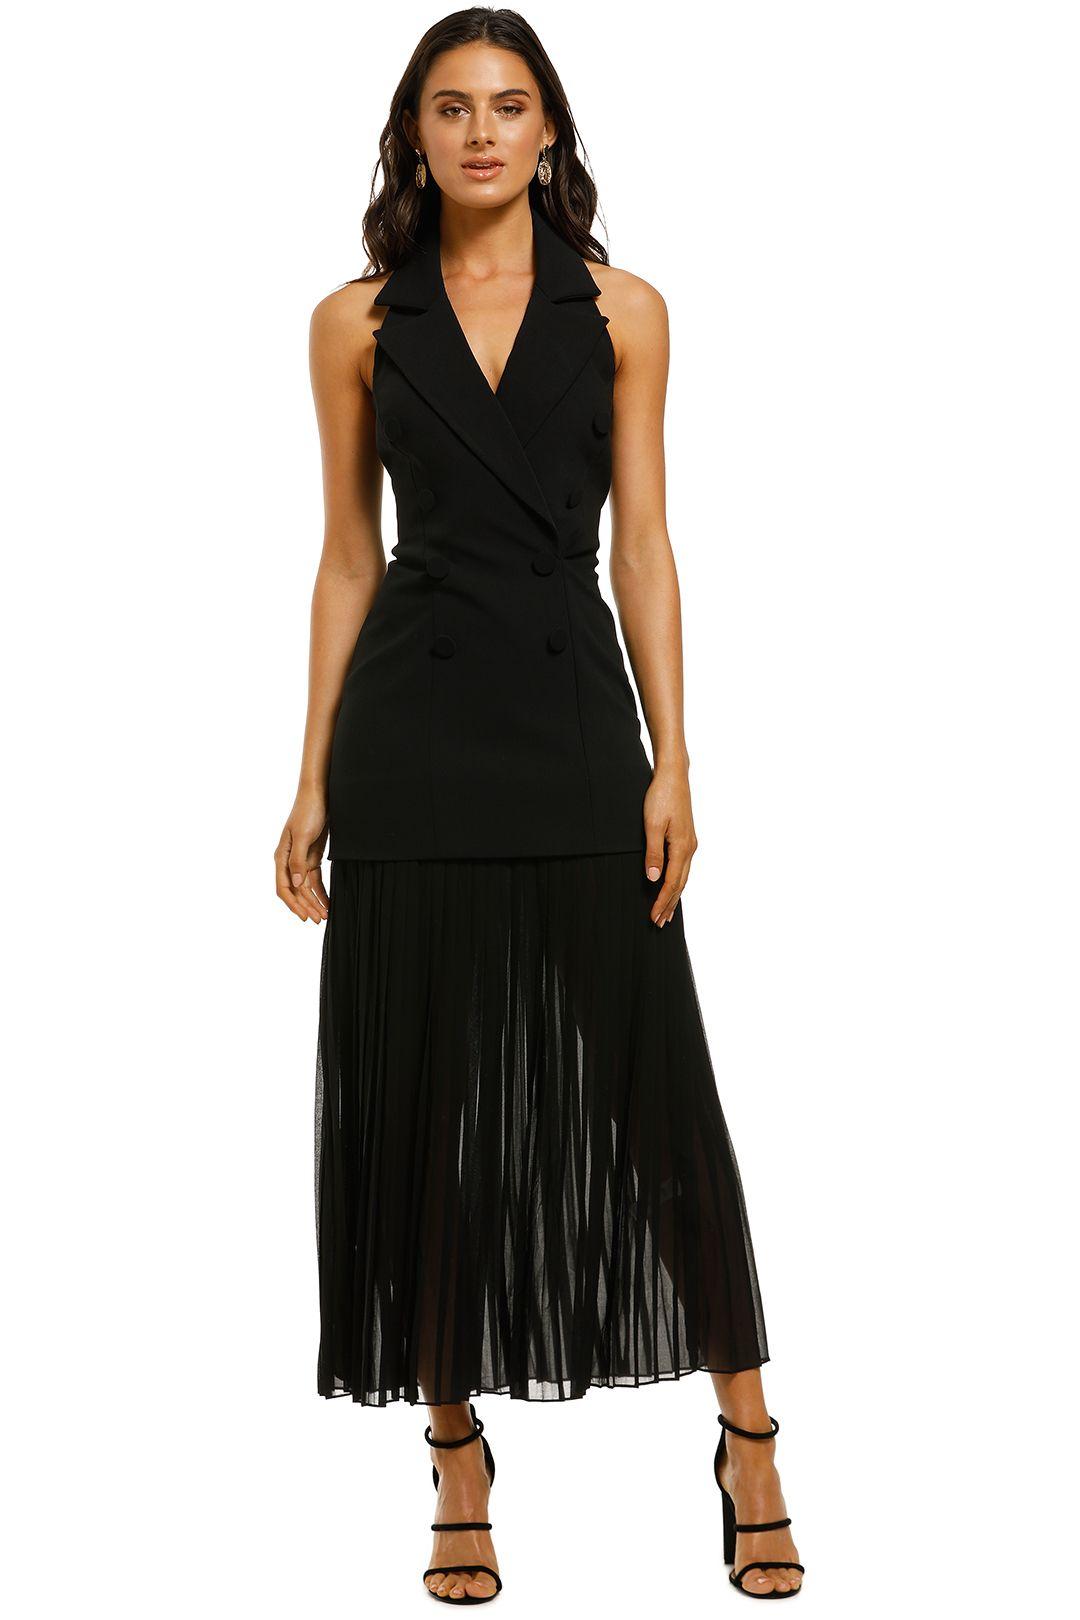 Misha-Collection-Sammiah-Dress-Black-Front